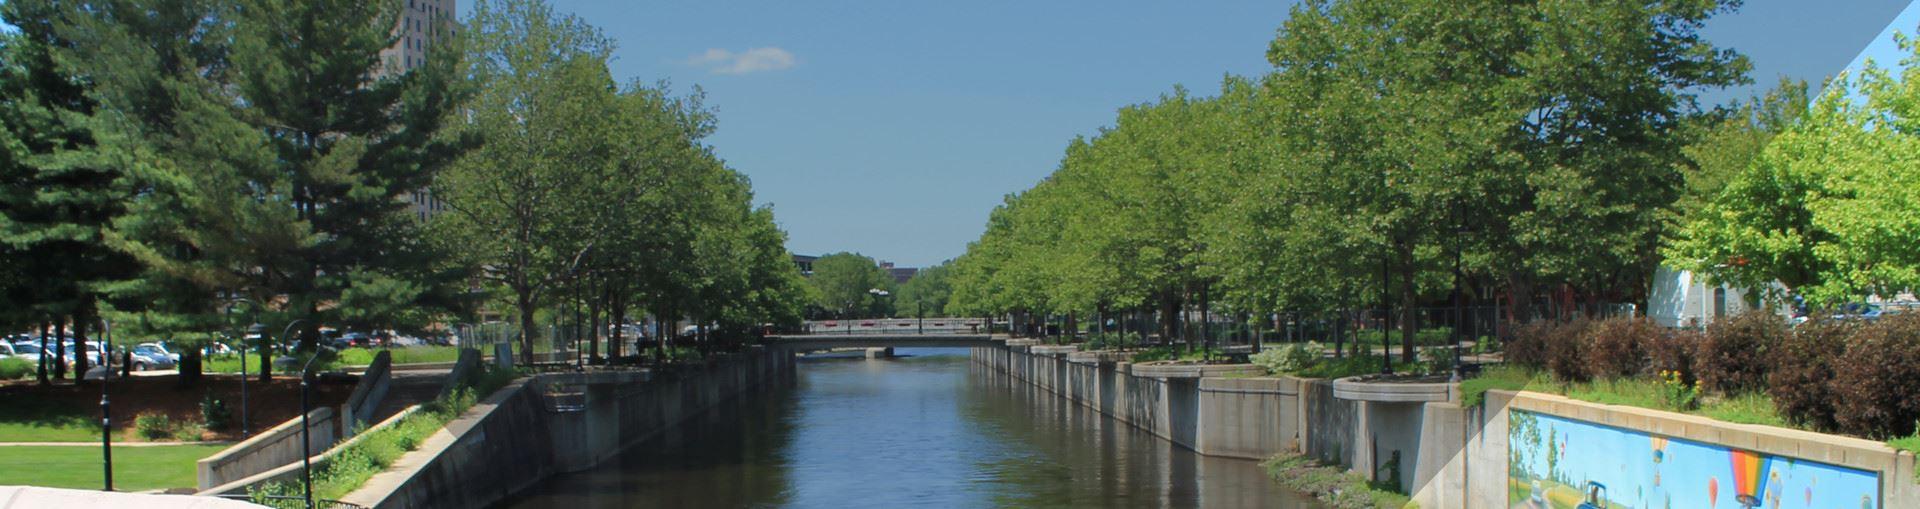 Income Tax Forms | Battle Creek, MI